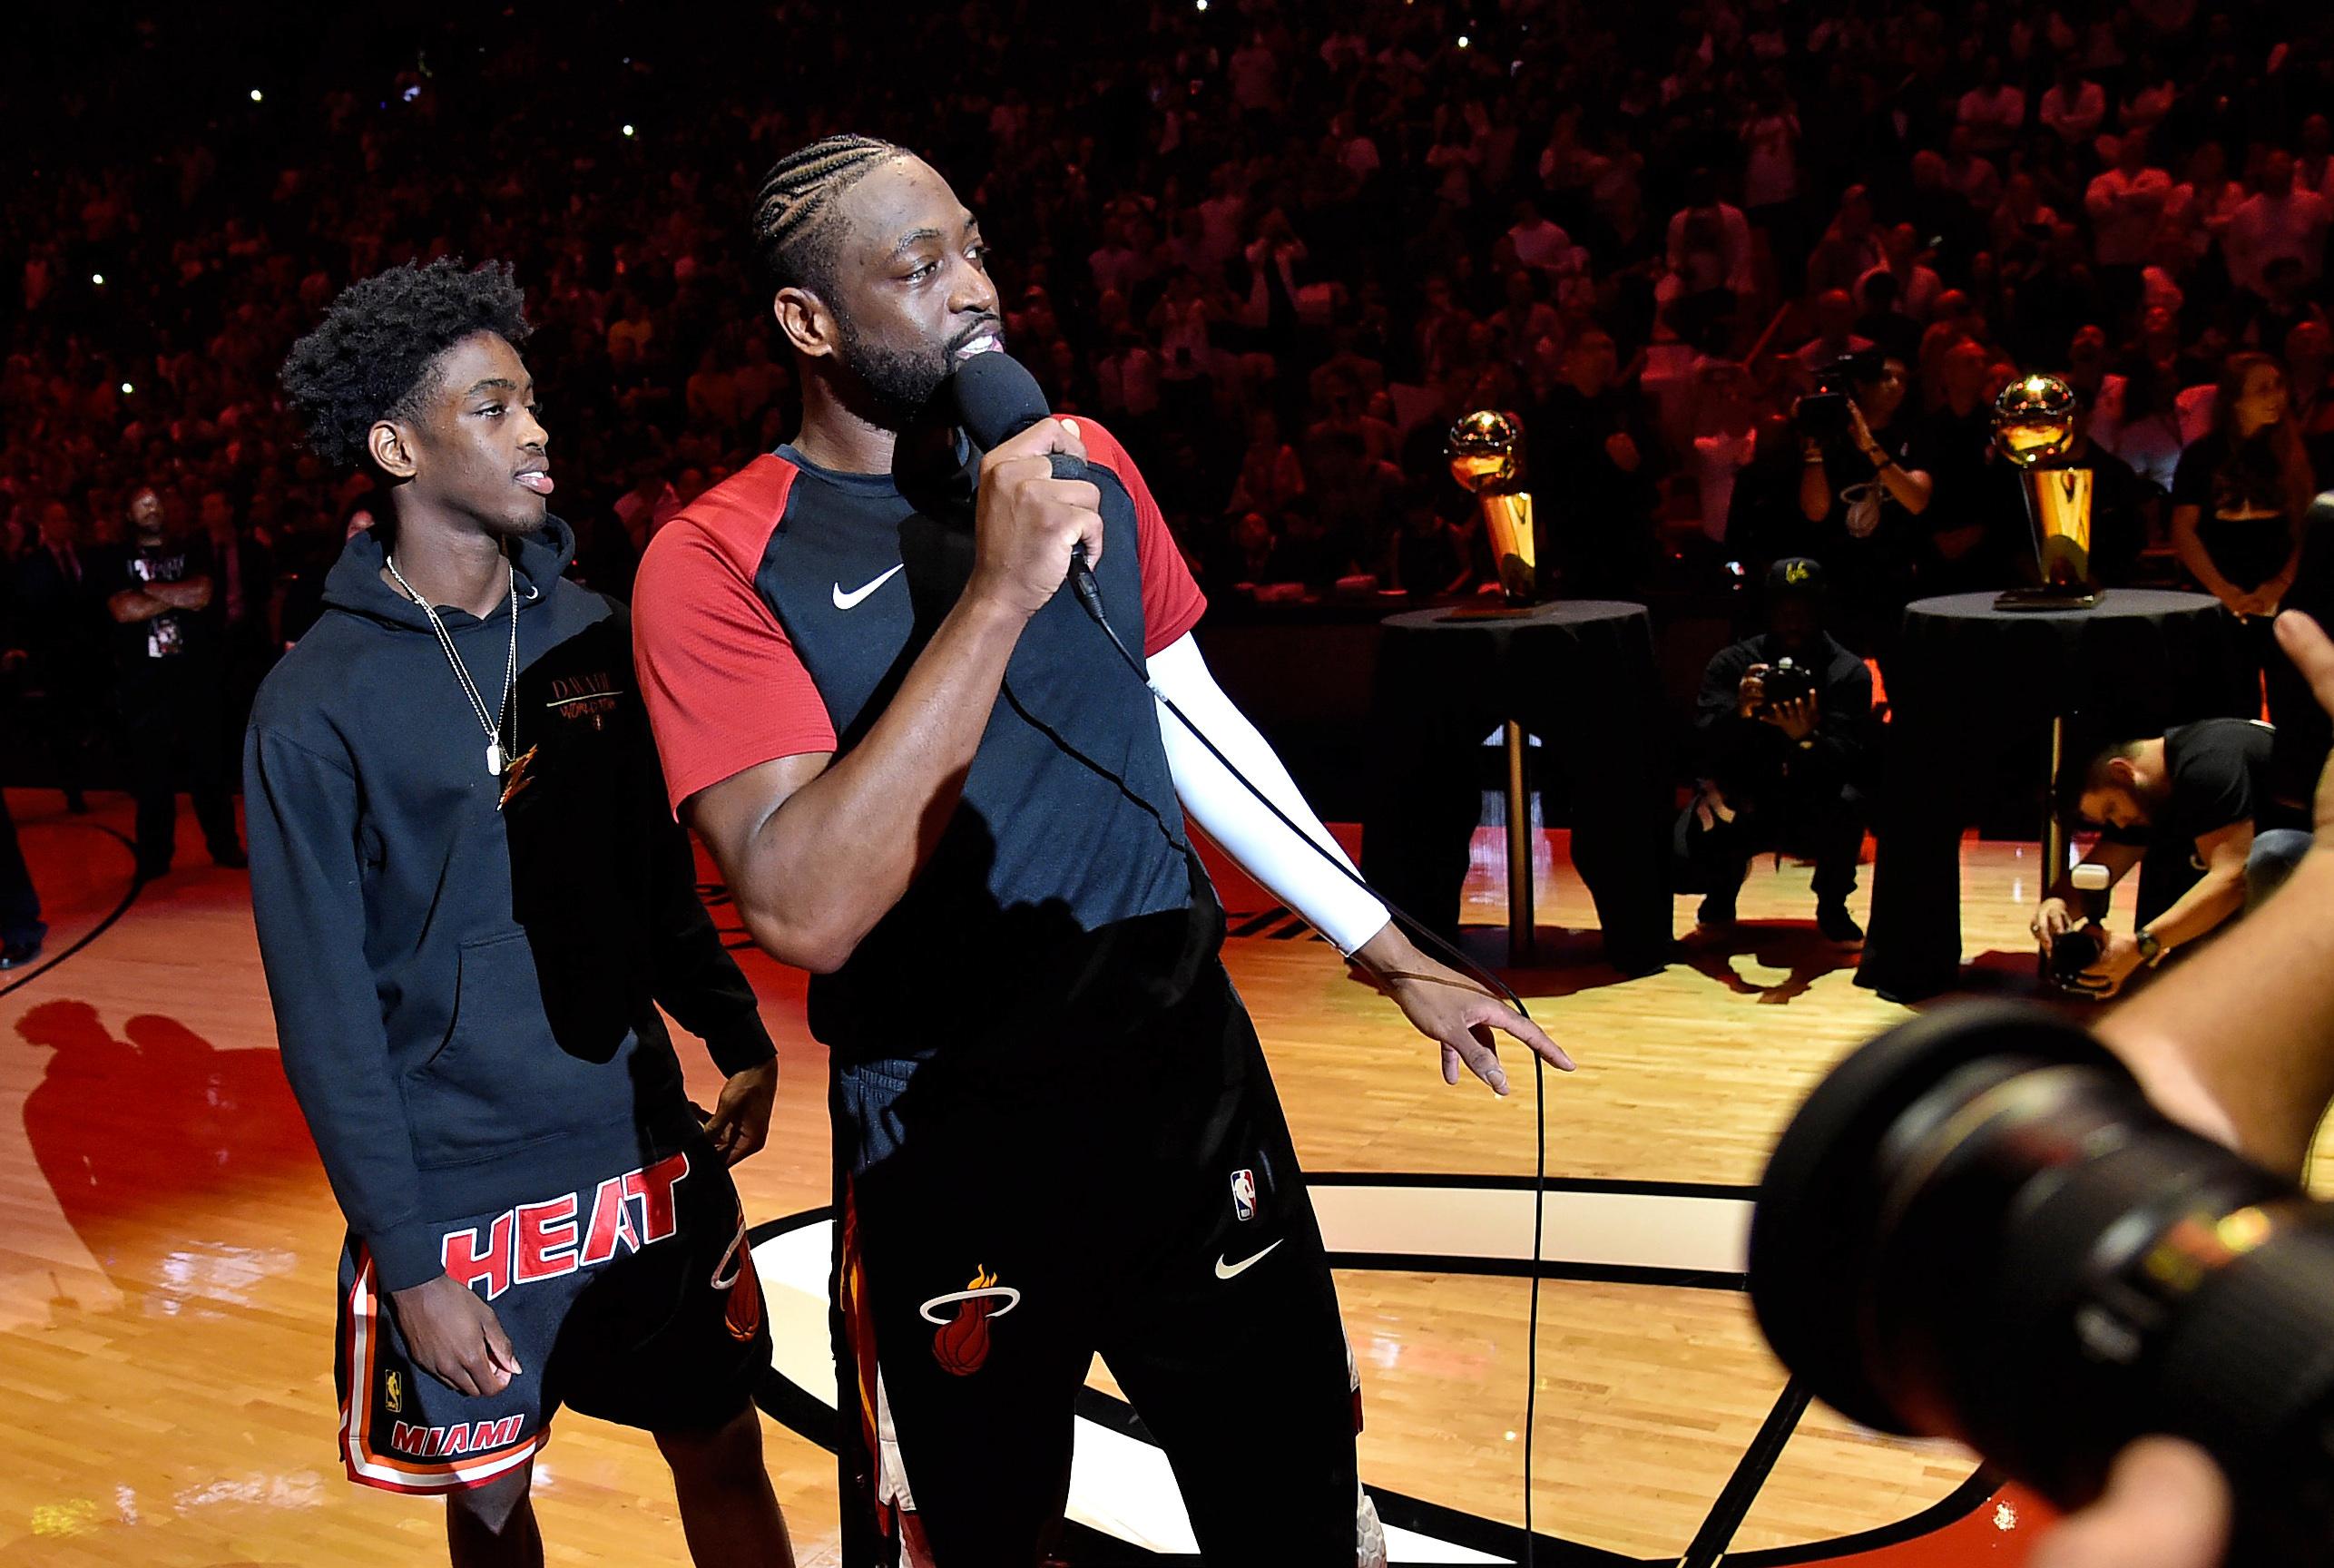 Miami Heat honor Dwyane Wade before final home game of NBA career (Video)